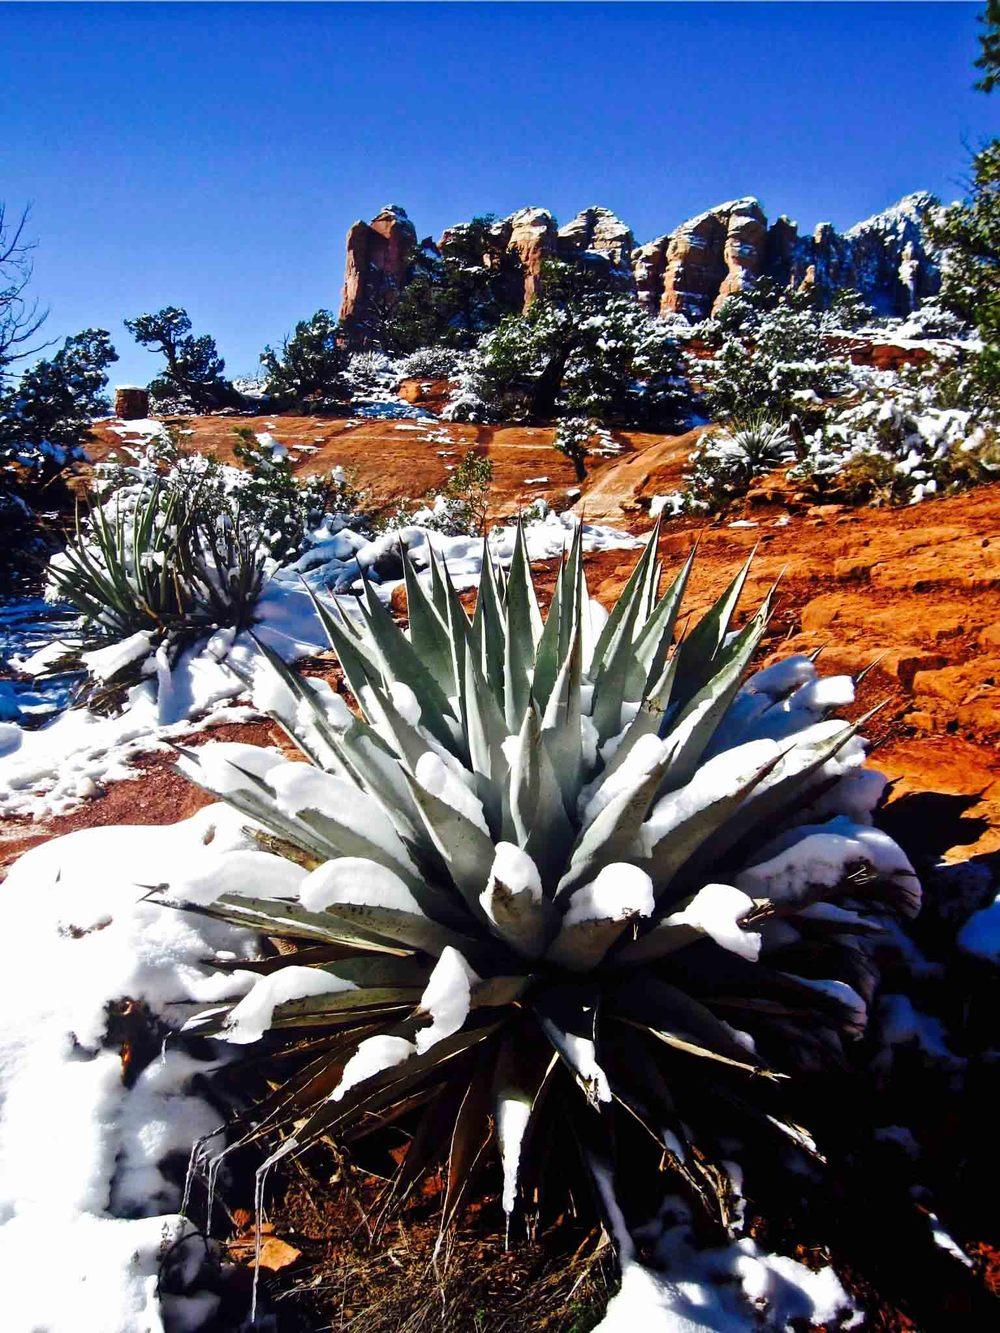 Soldiers' Pass, Sedona, Arizona, January 2011 Soldiers' Pass, Sedona, Arizona, January 2011